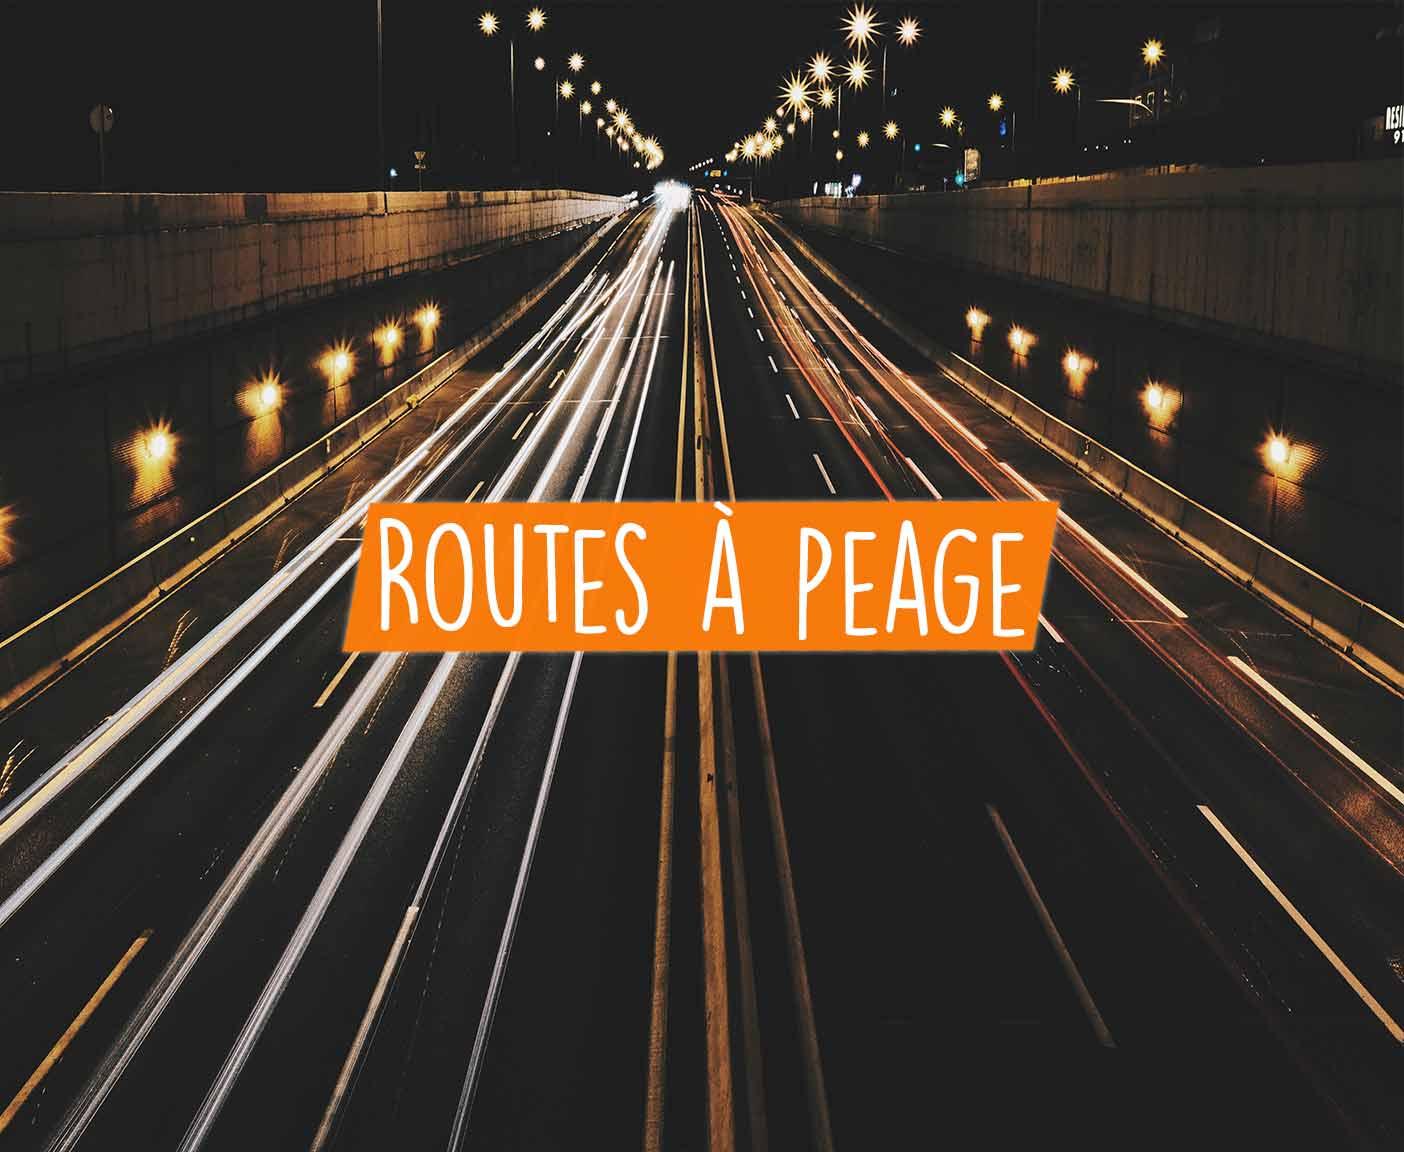 espagne-route-peage-autoroute-roadtrip-vacance-vehicule